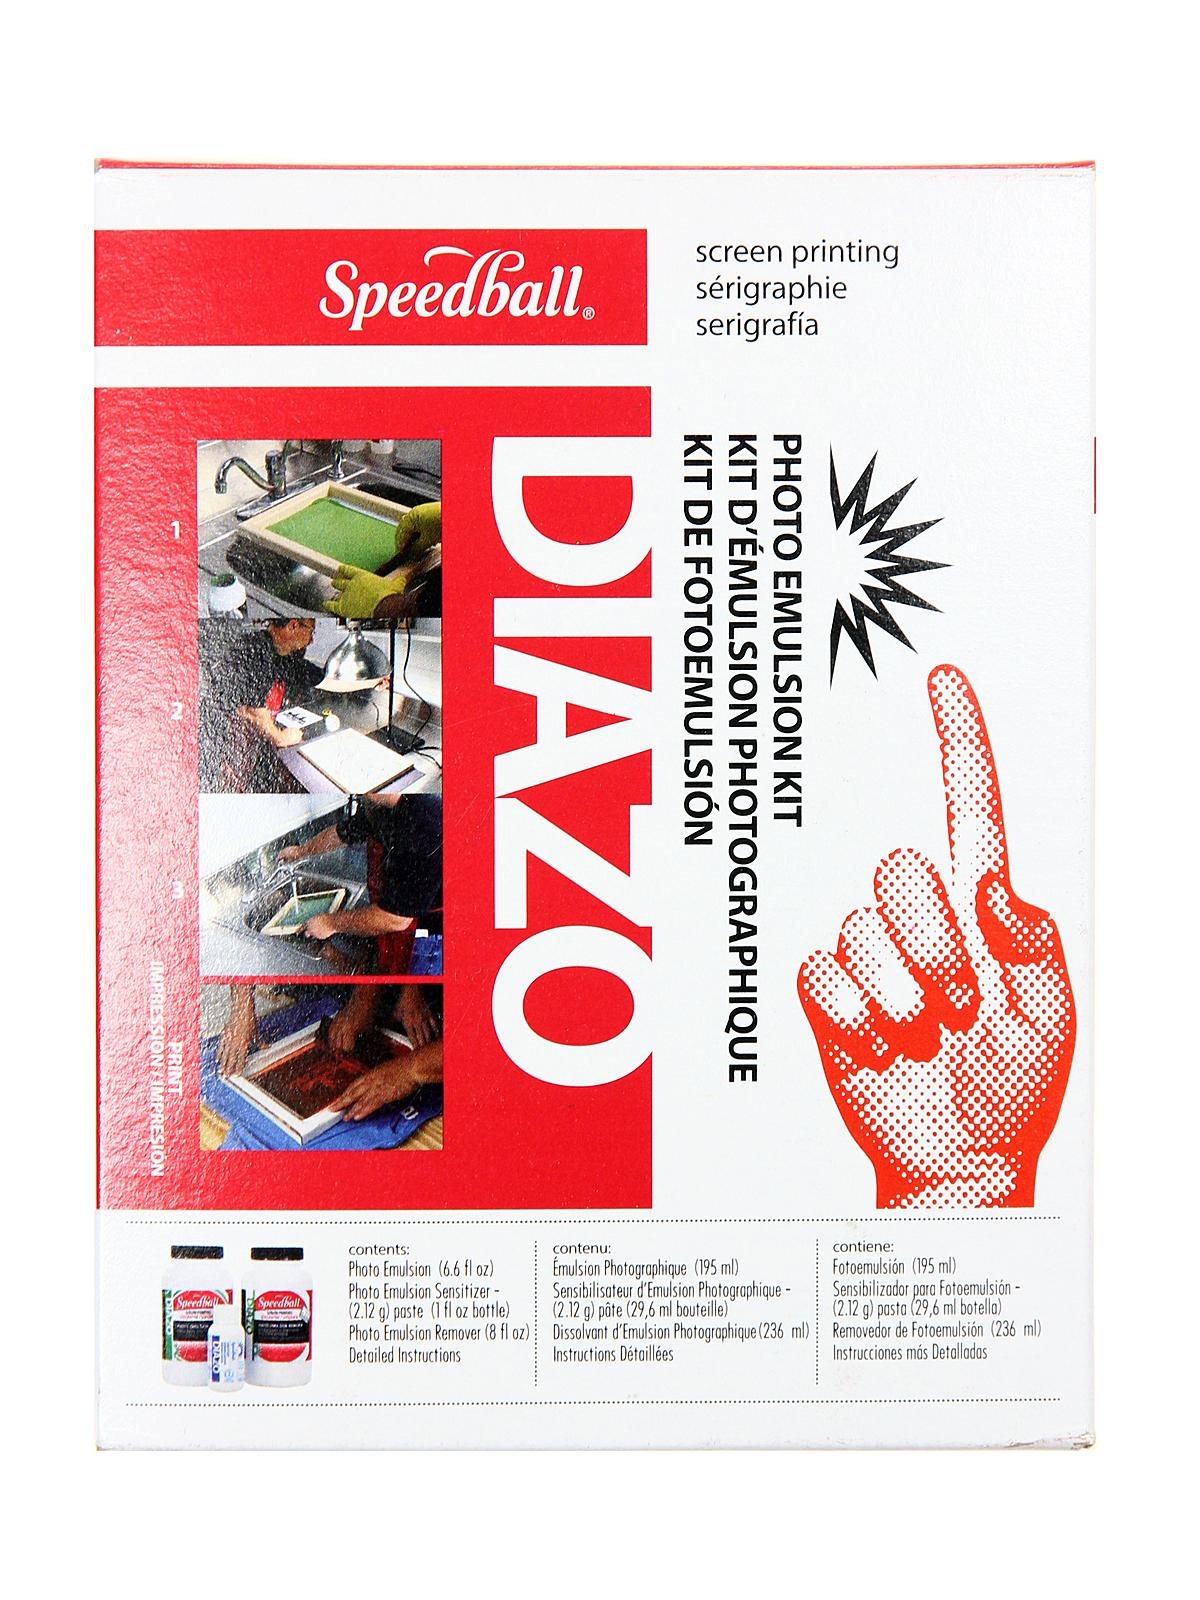 speedball screen printing kit instructions